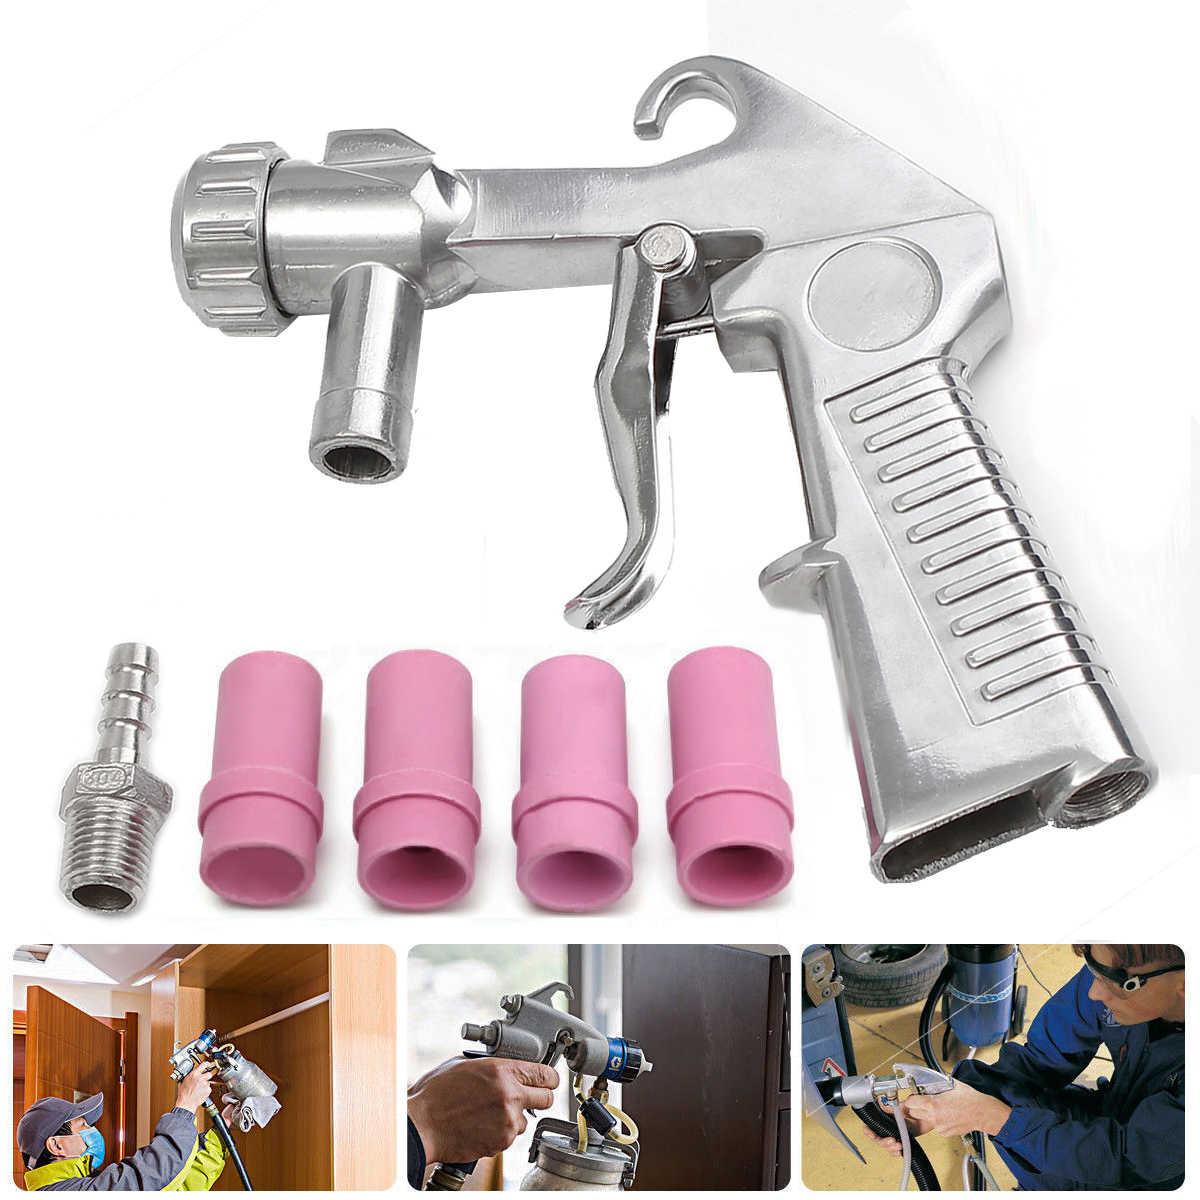 New Sandblaster Feed Blast Gun Air Siphon Sand Blasting Abrasive Gun Ceramic Nozzles Tips Kit Power Tools Spray Gun